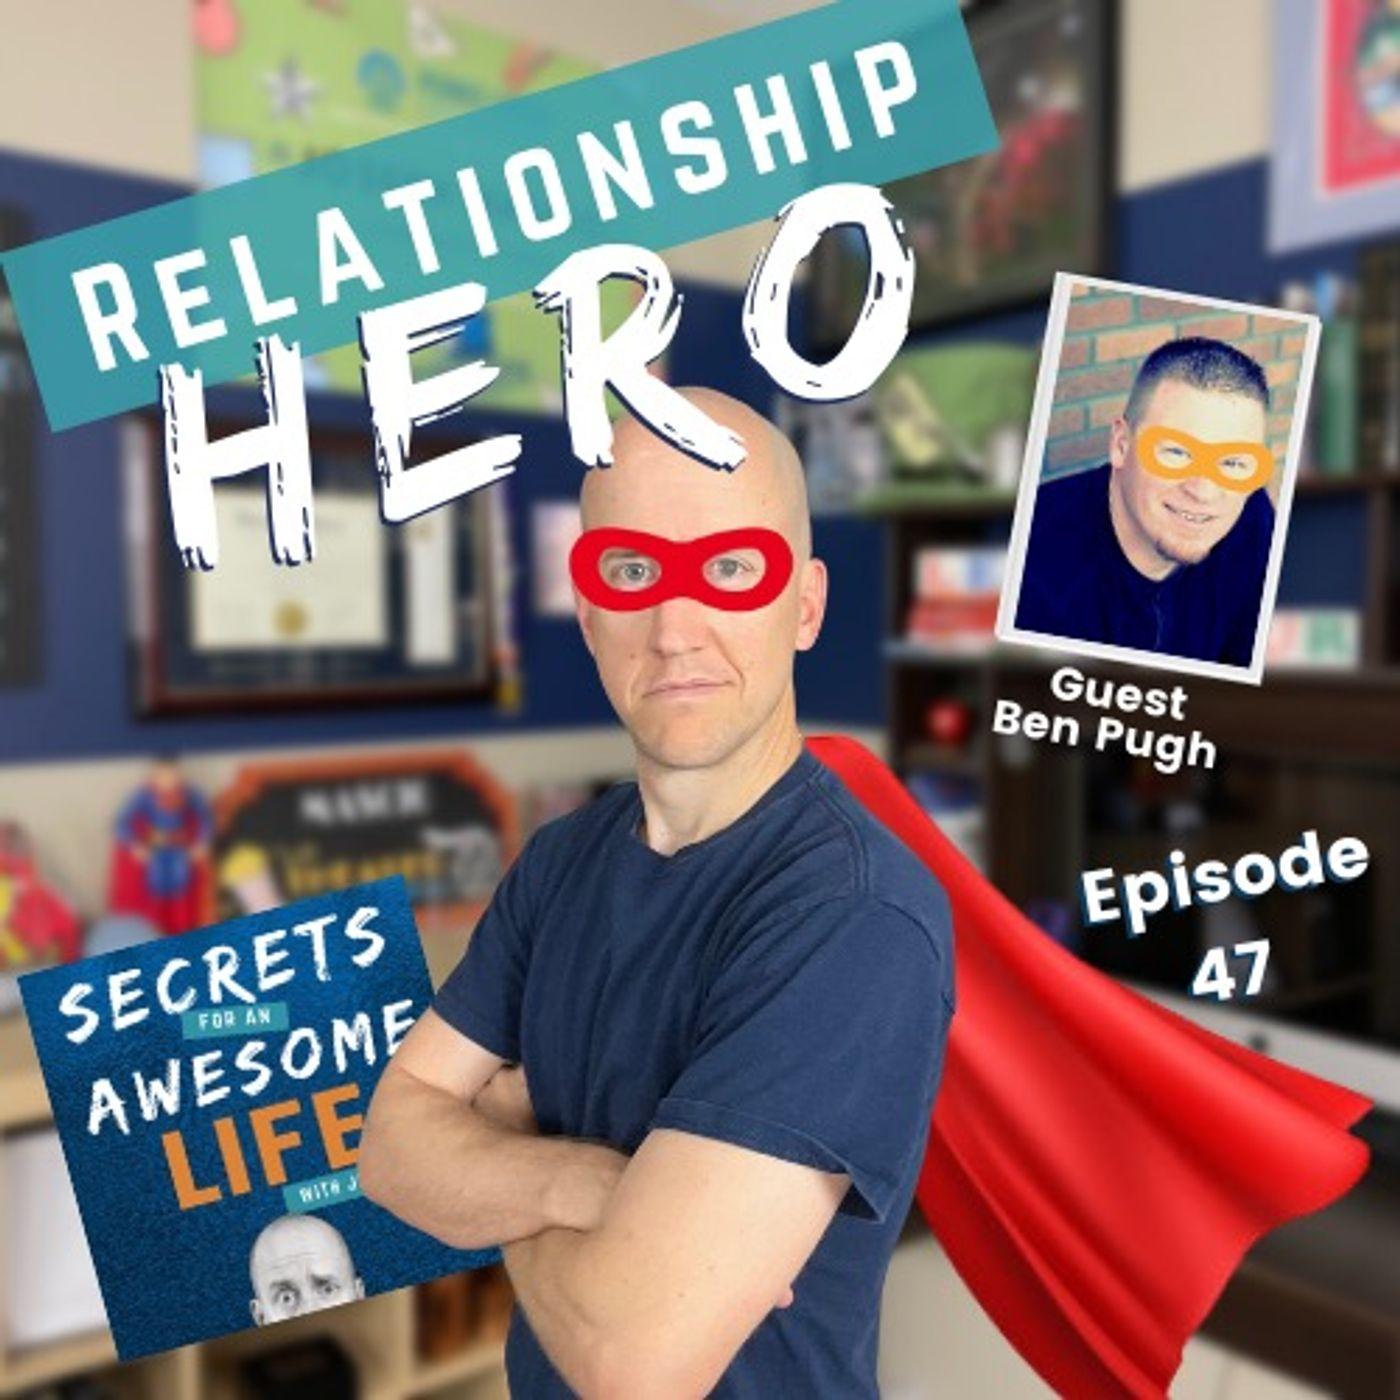 Relationship Hero